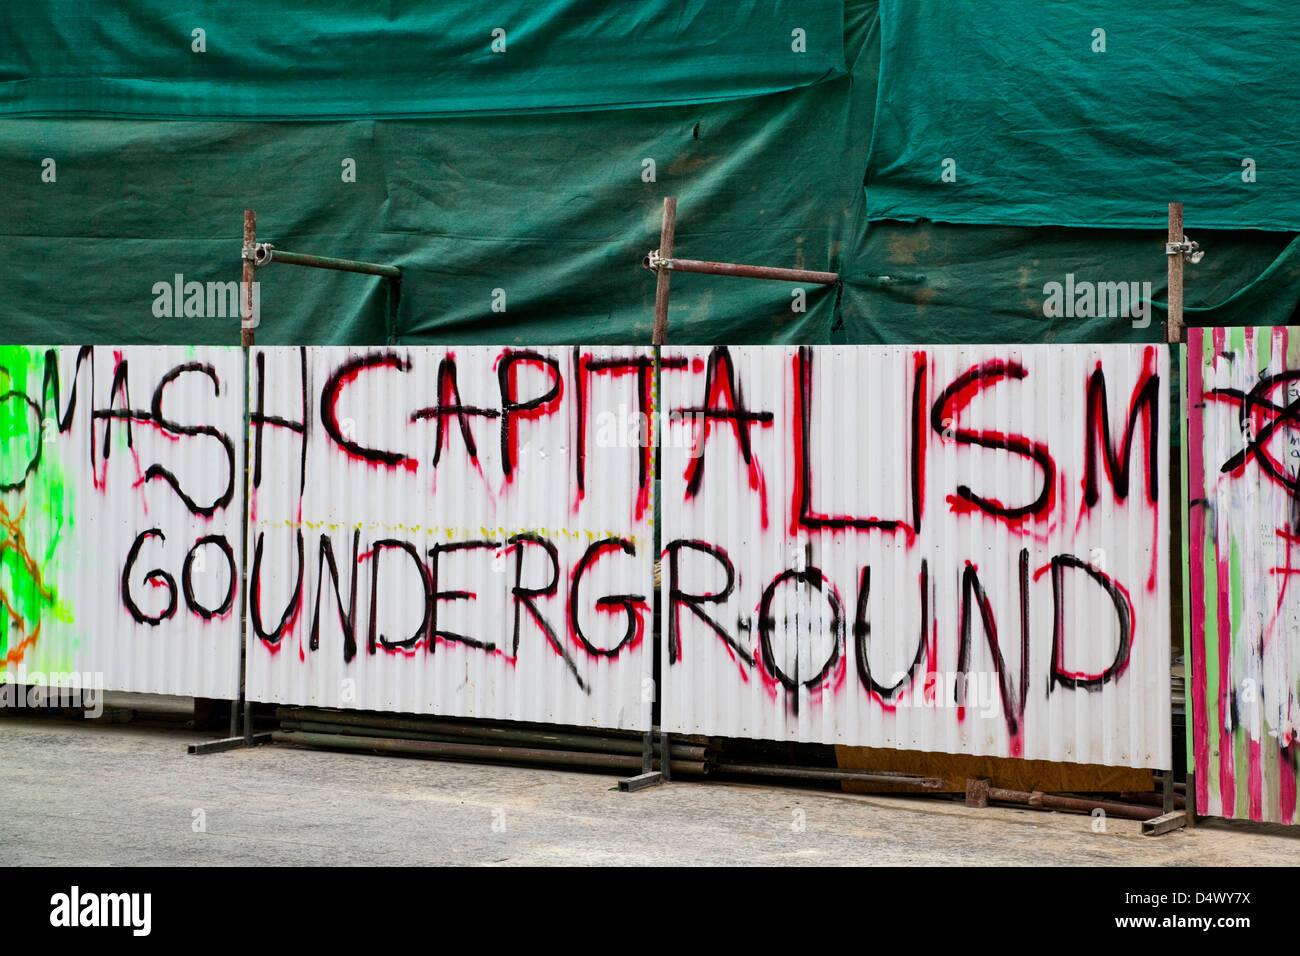 Anti-capitalist slogans and grafitti on hoardings, Nicosia, Cyprus - Stock Image